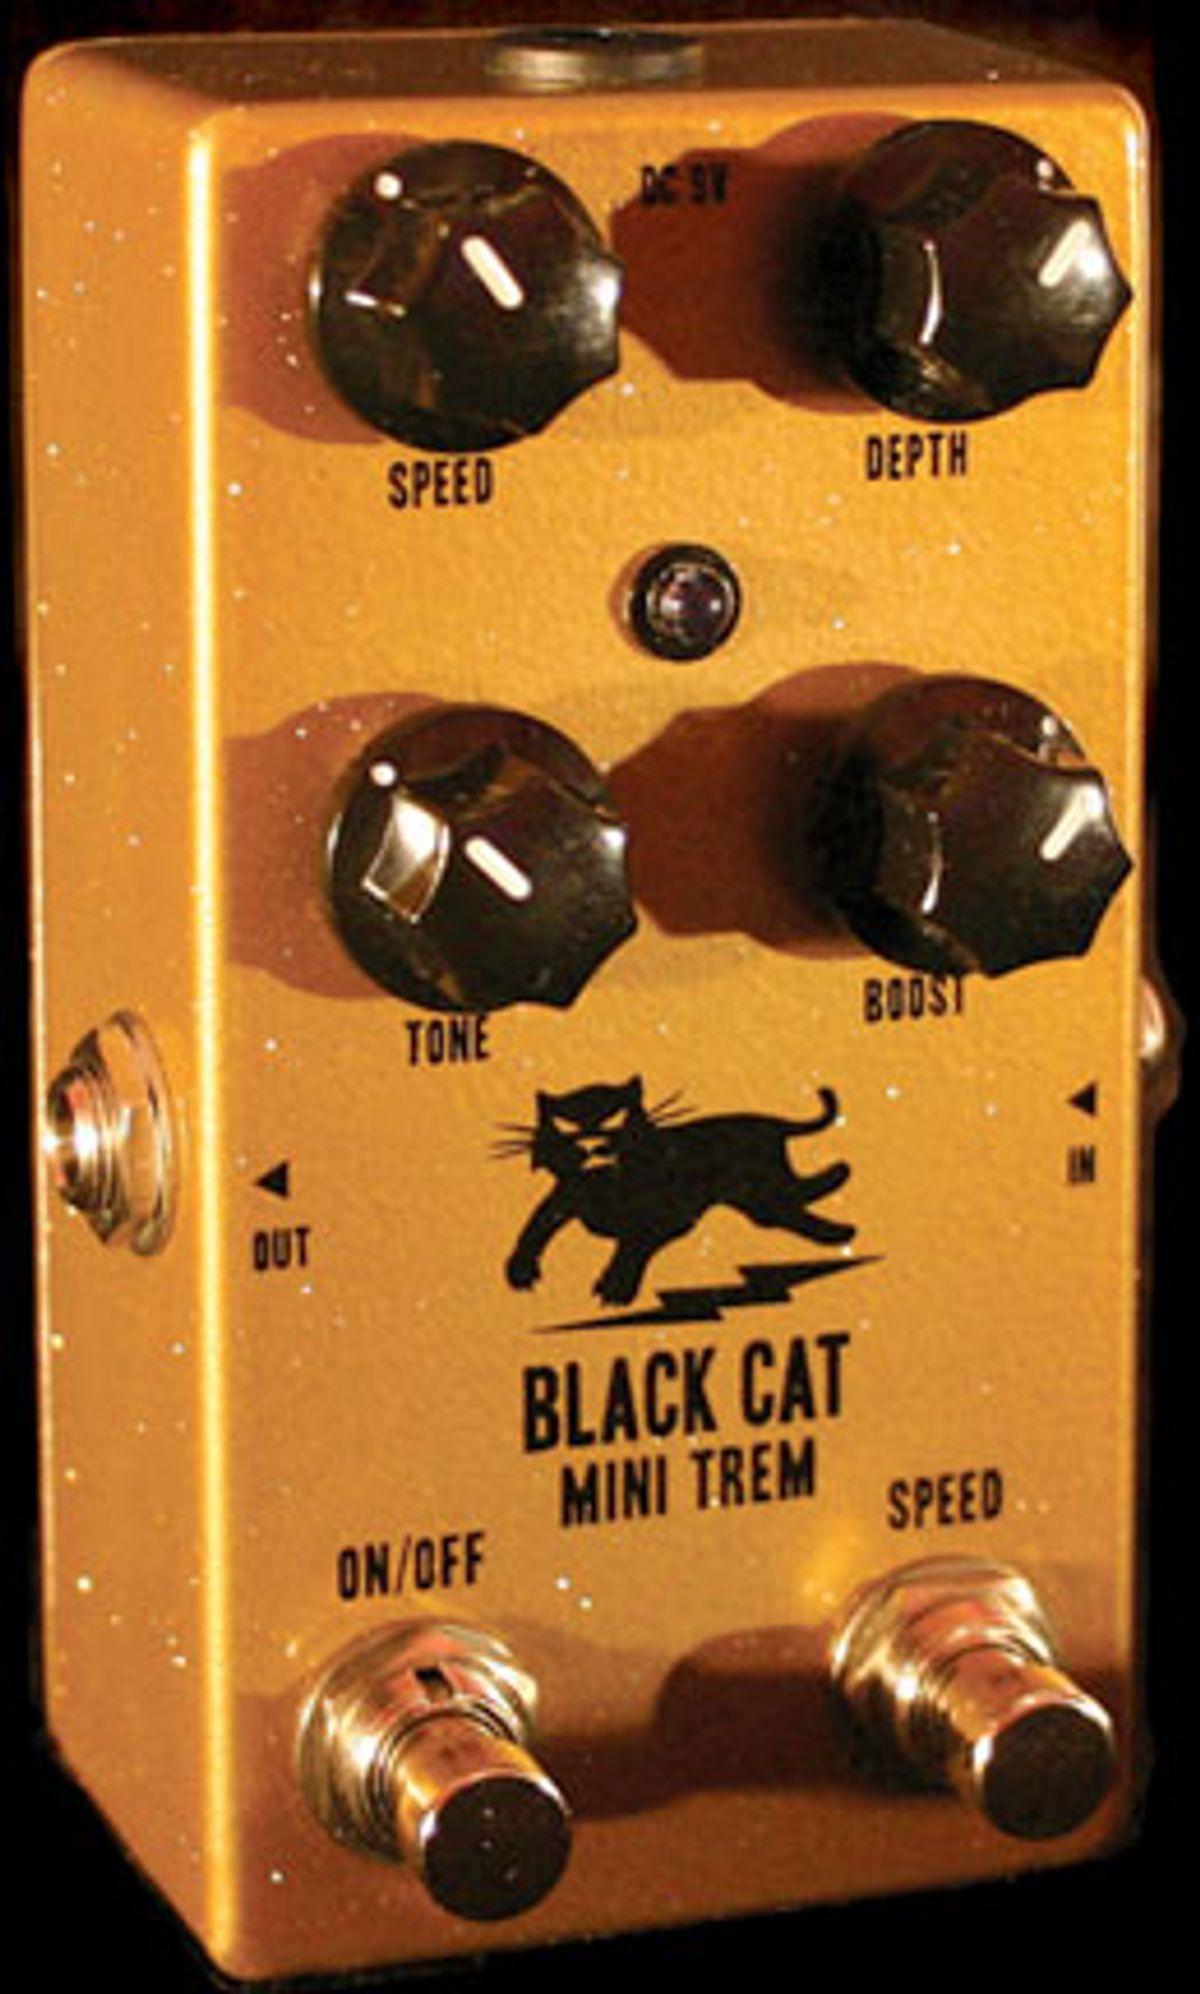 Black Cat Pedals Announce Mini Trem